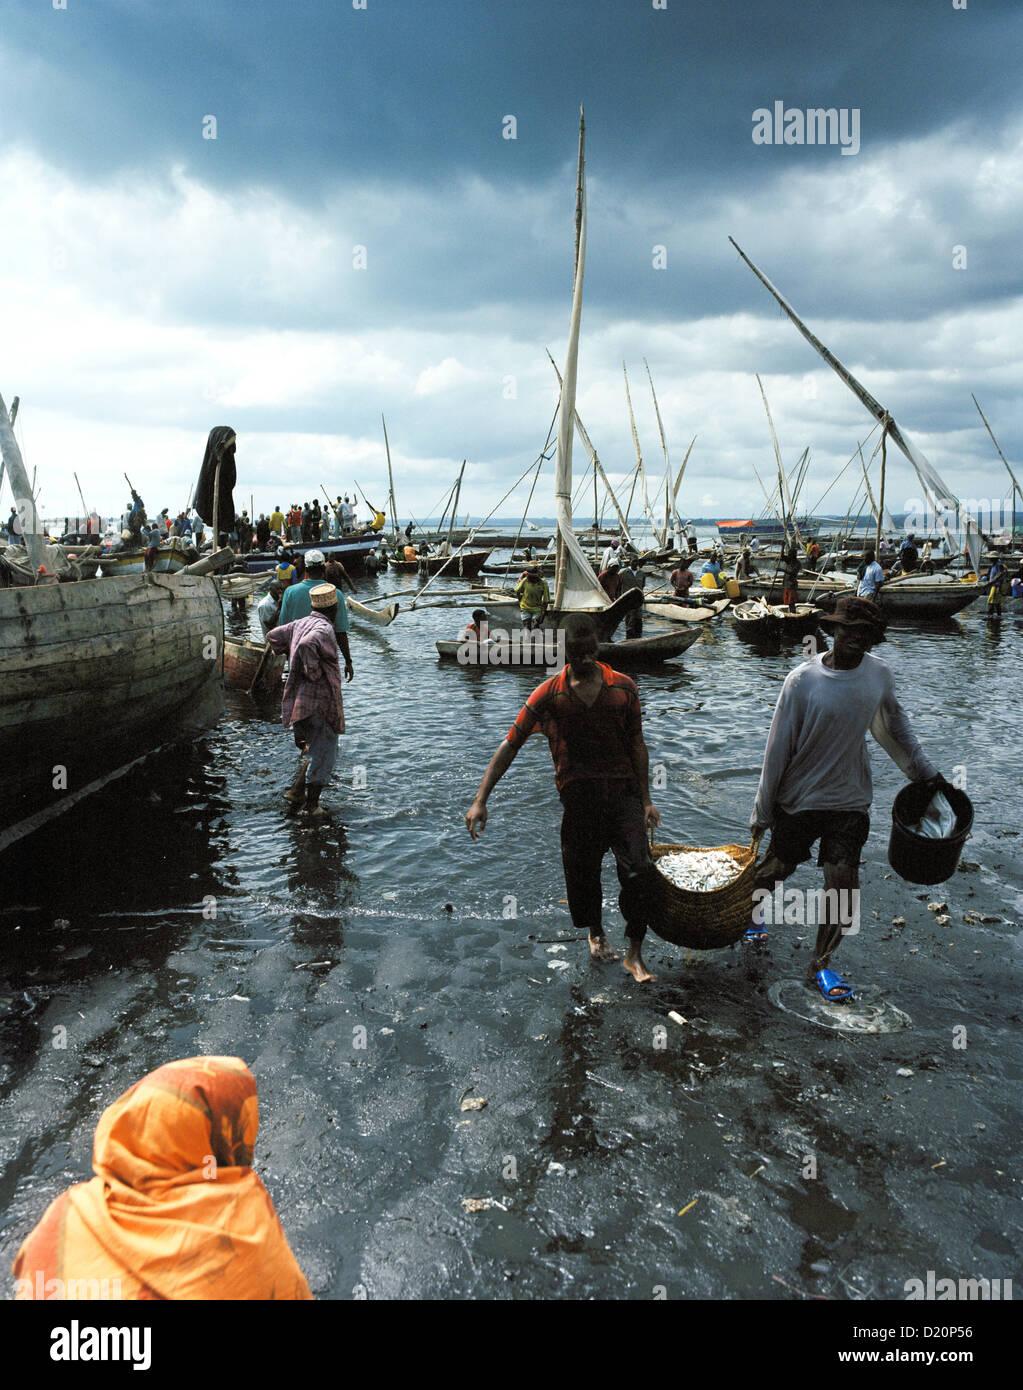 Fish market at the old Dhow harbour, fisher boats get unloaded, Malindi, Zanzibar Town, Zanzibar, Tanzania, East - Stock Image